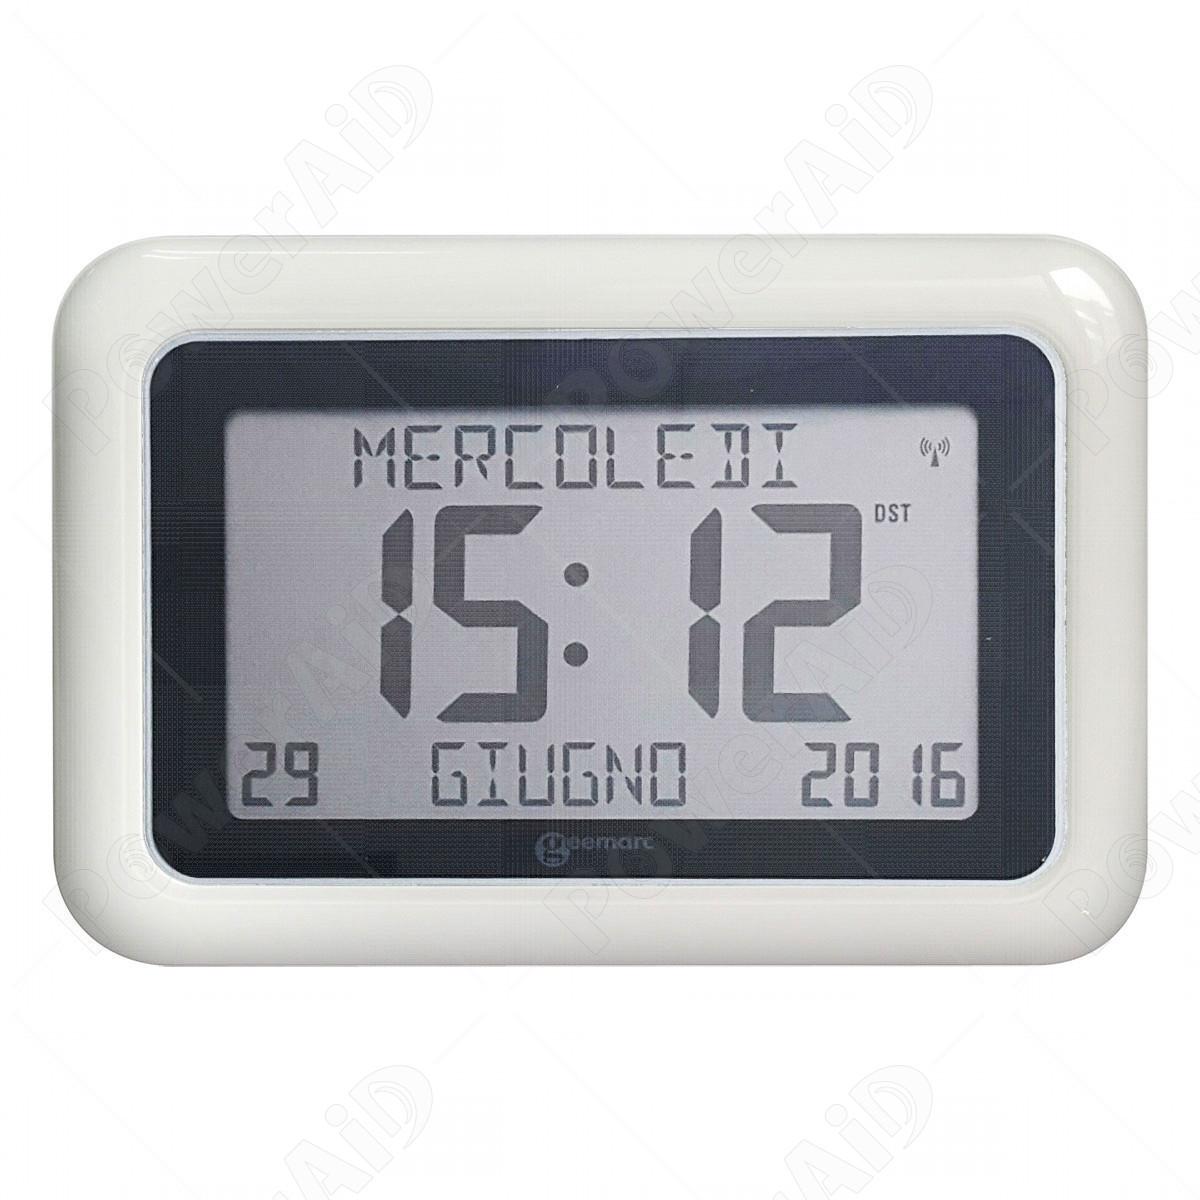 Calendario Digitale Per Anziani.Geemarc Viso10 Orologio Per Demenza Bianco